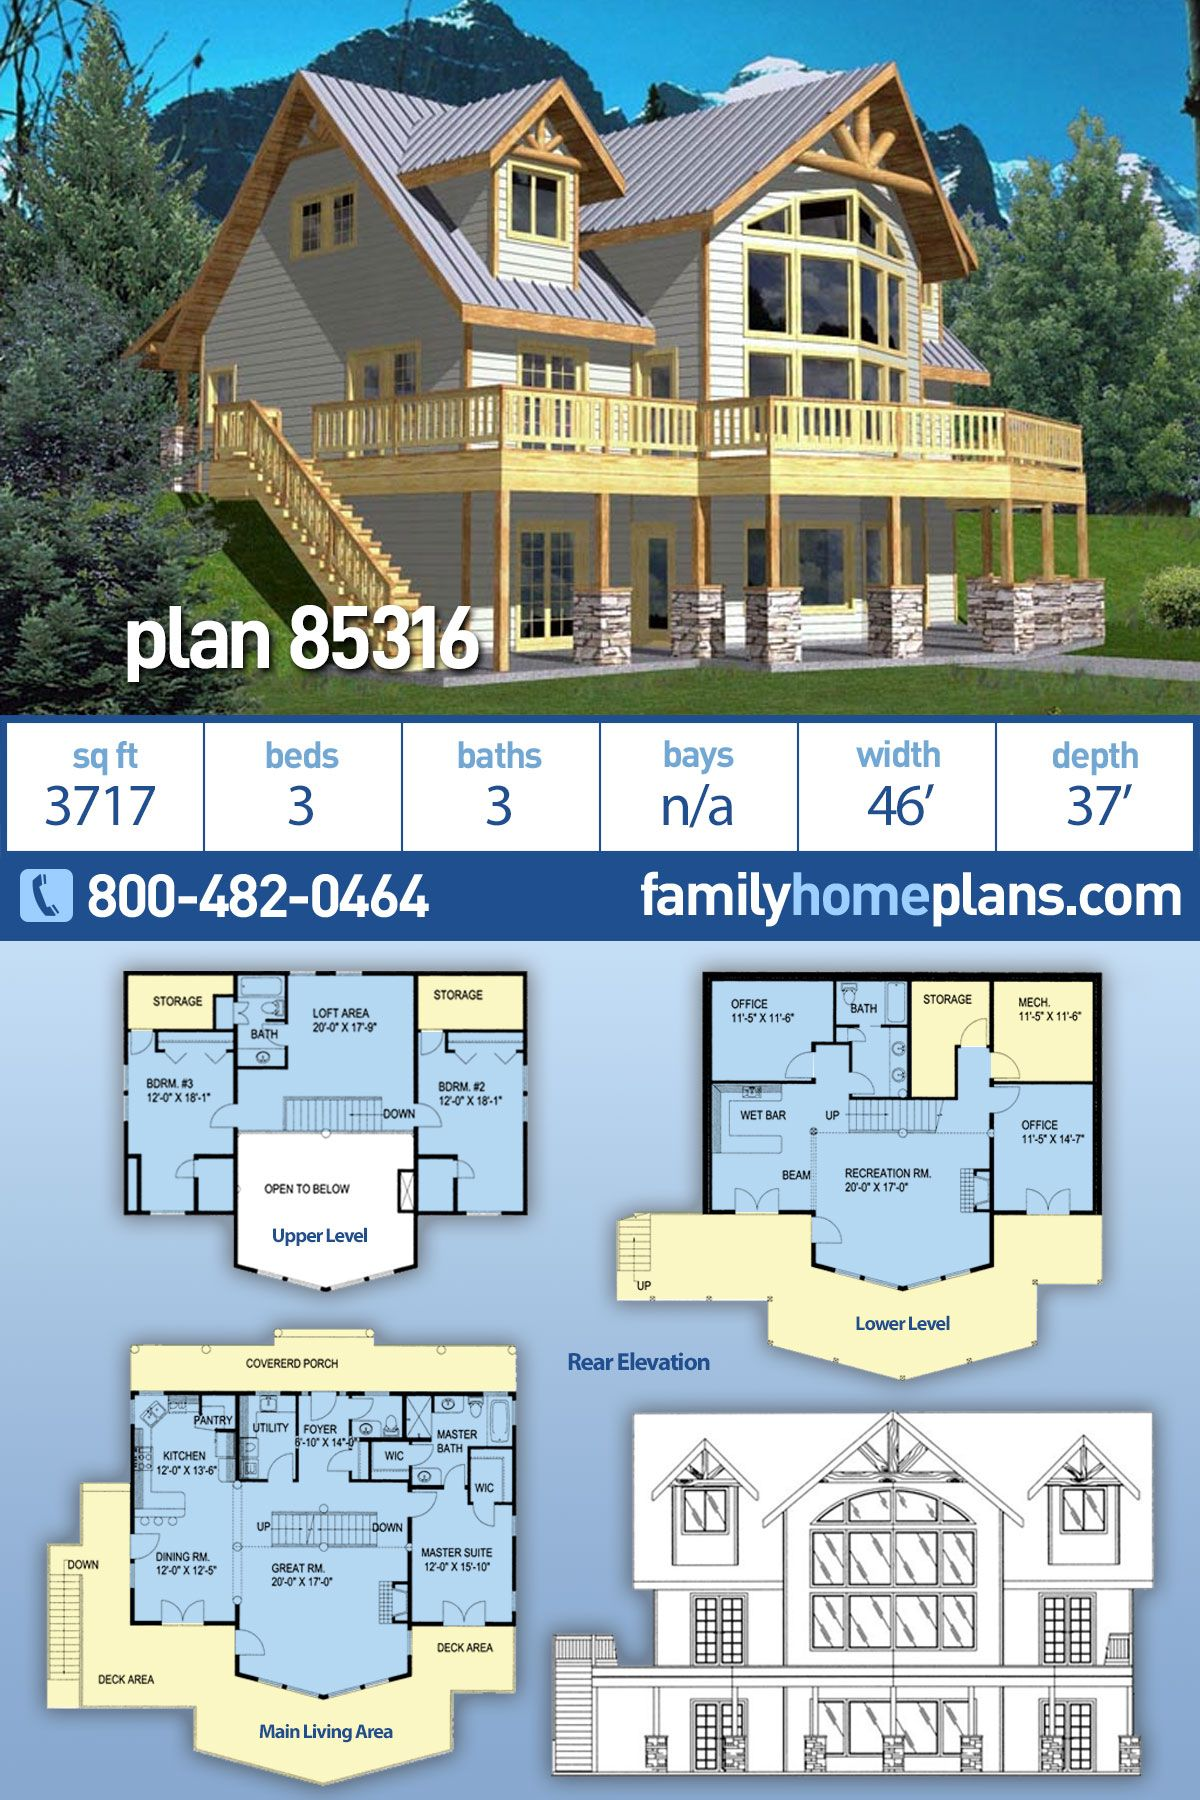 Coastal Style House Plan 85316 With 3 Bed 3 Bath Coastal House Plans House Plans Vacation House Plans